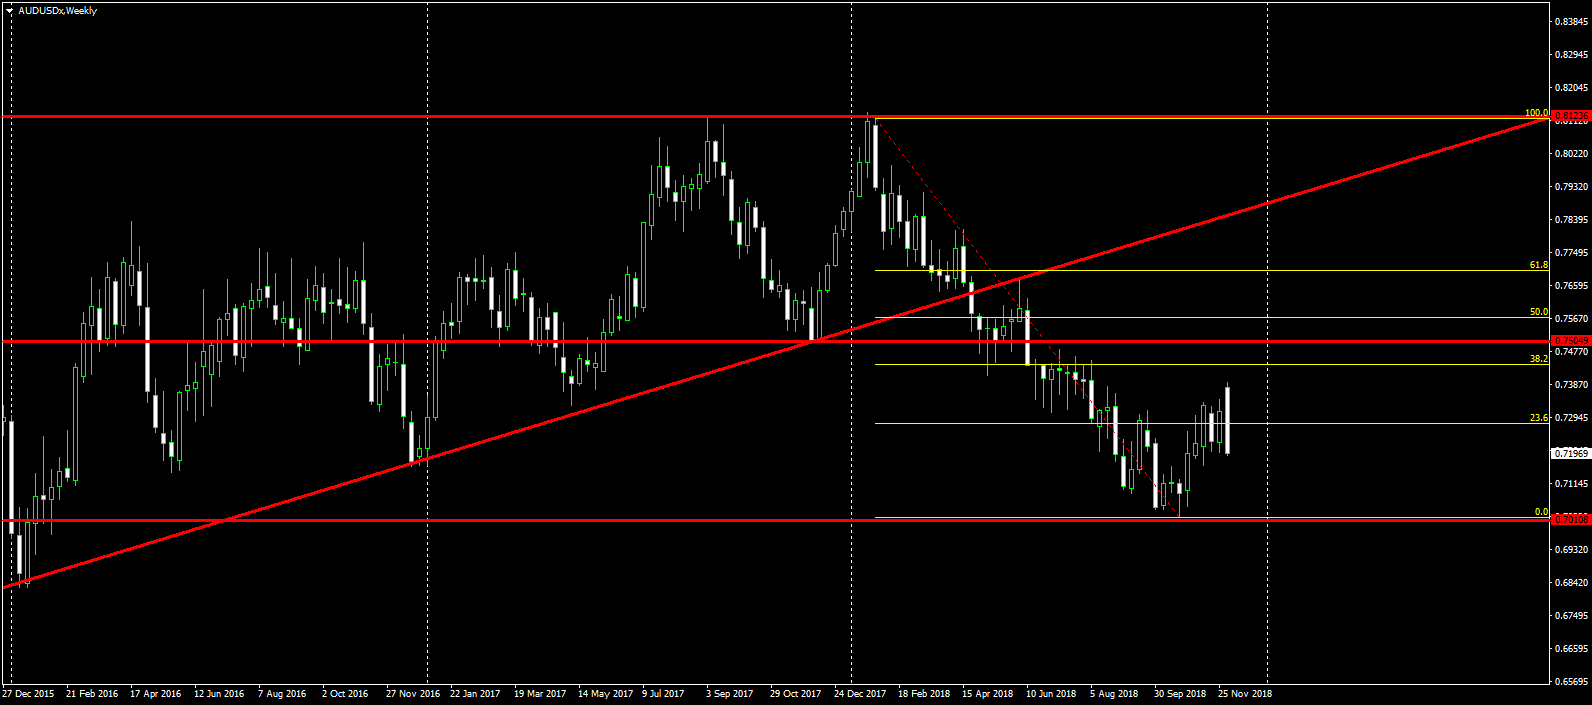 Weekly AUD/USD